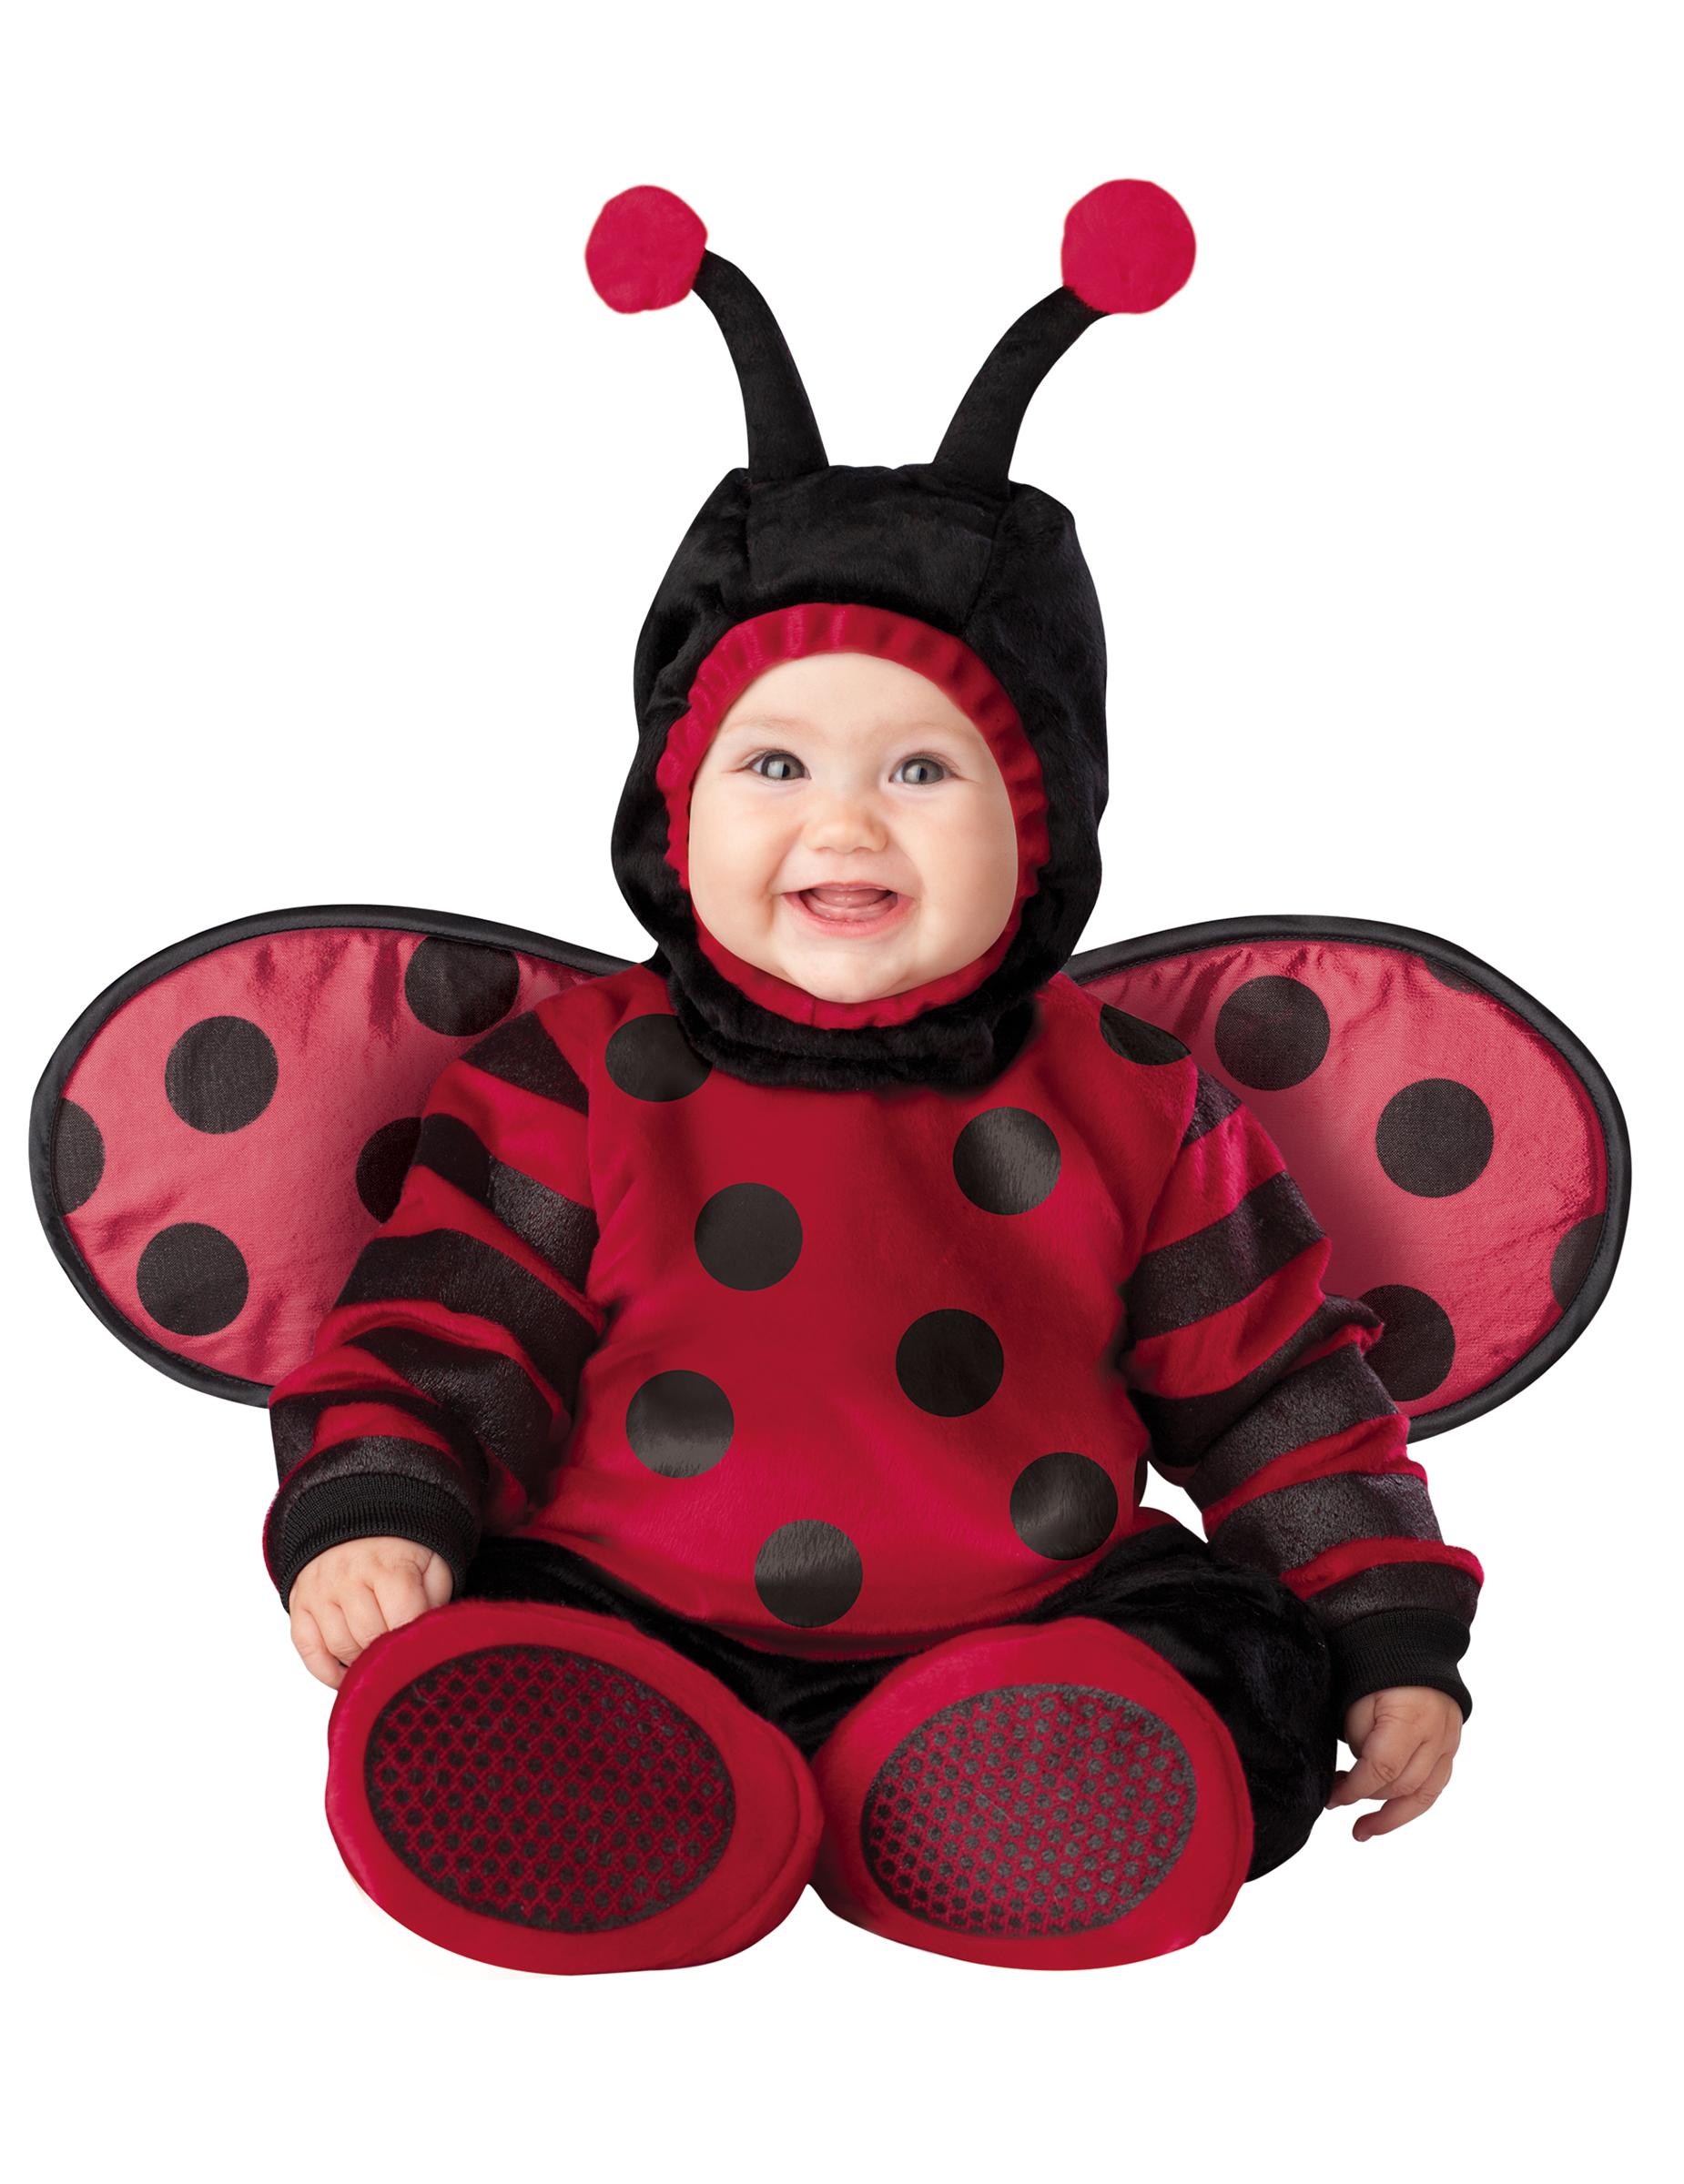 Premium Rød Mariehøne Baby Udklædning Køb Kostumer Til Børn På